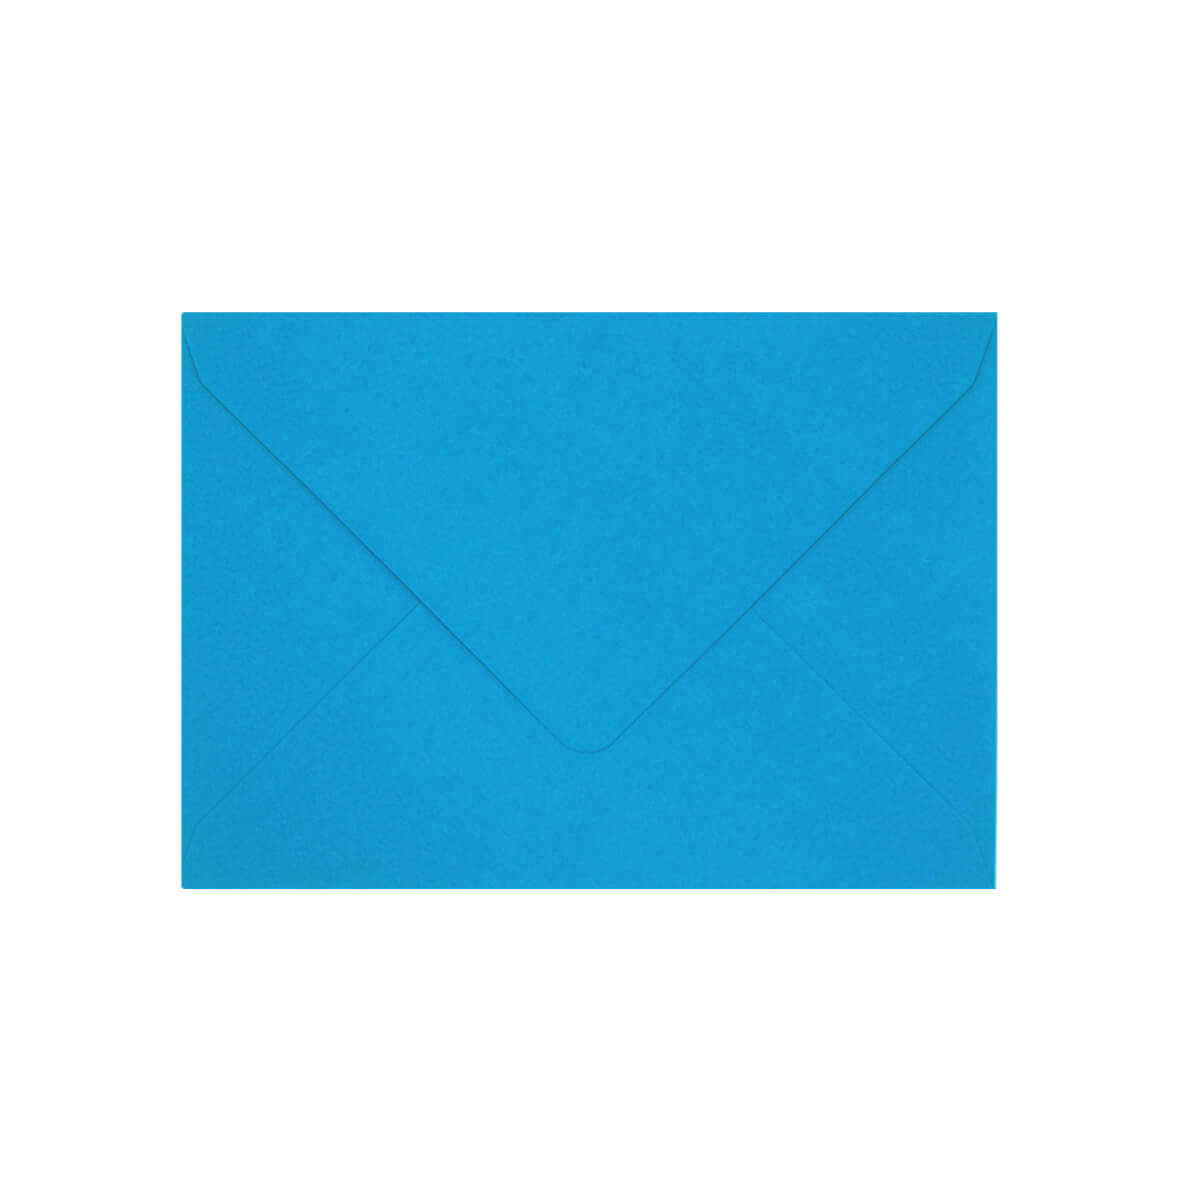 BRIGHT BLUE 152 x 216 mm ENVELOPES 120GSM (i9)